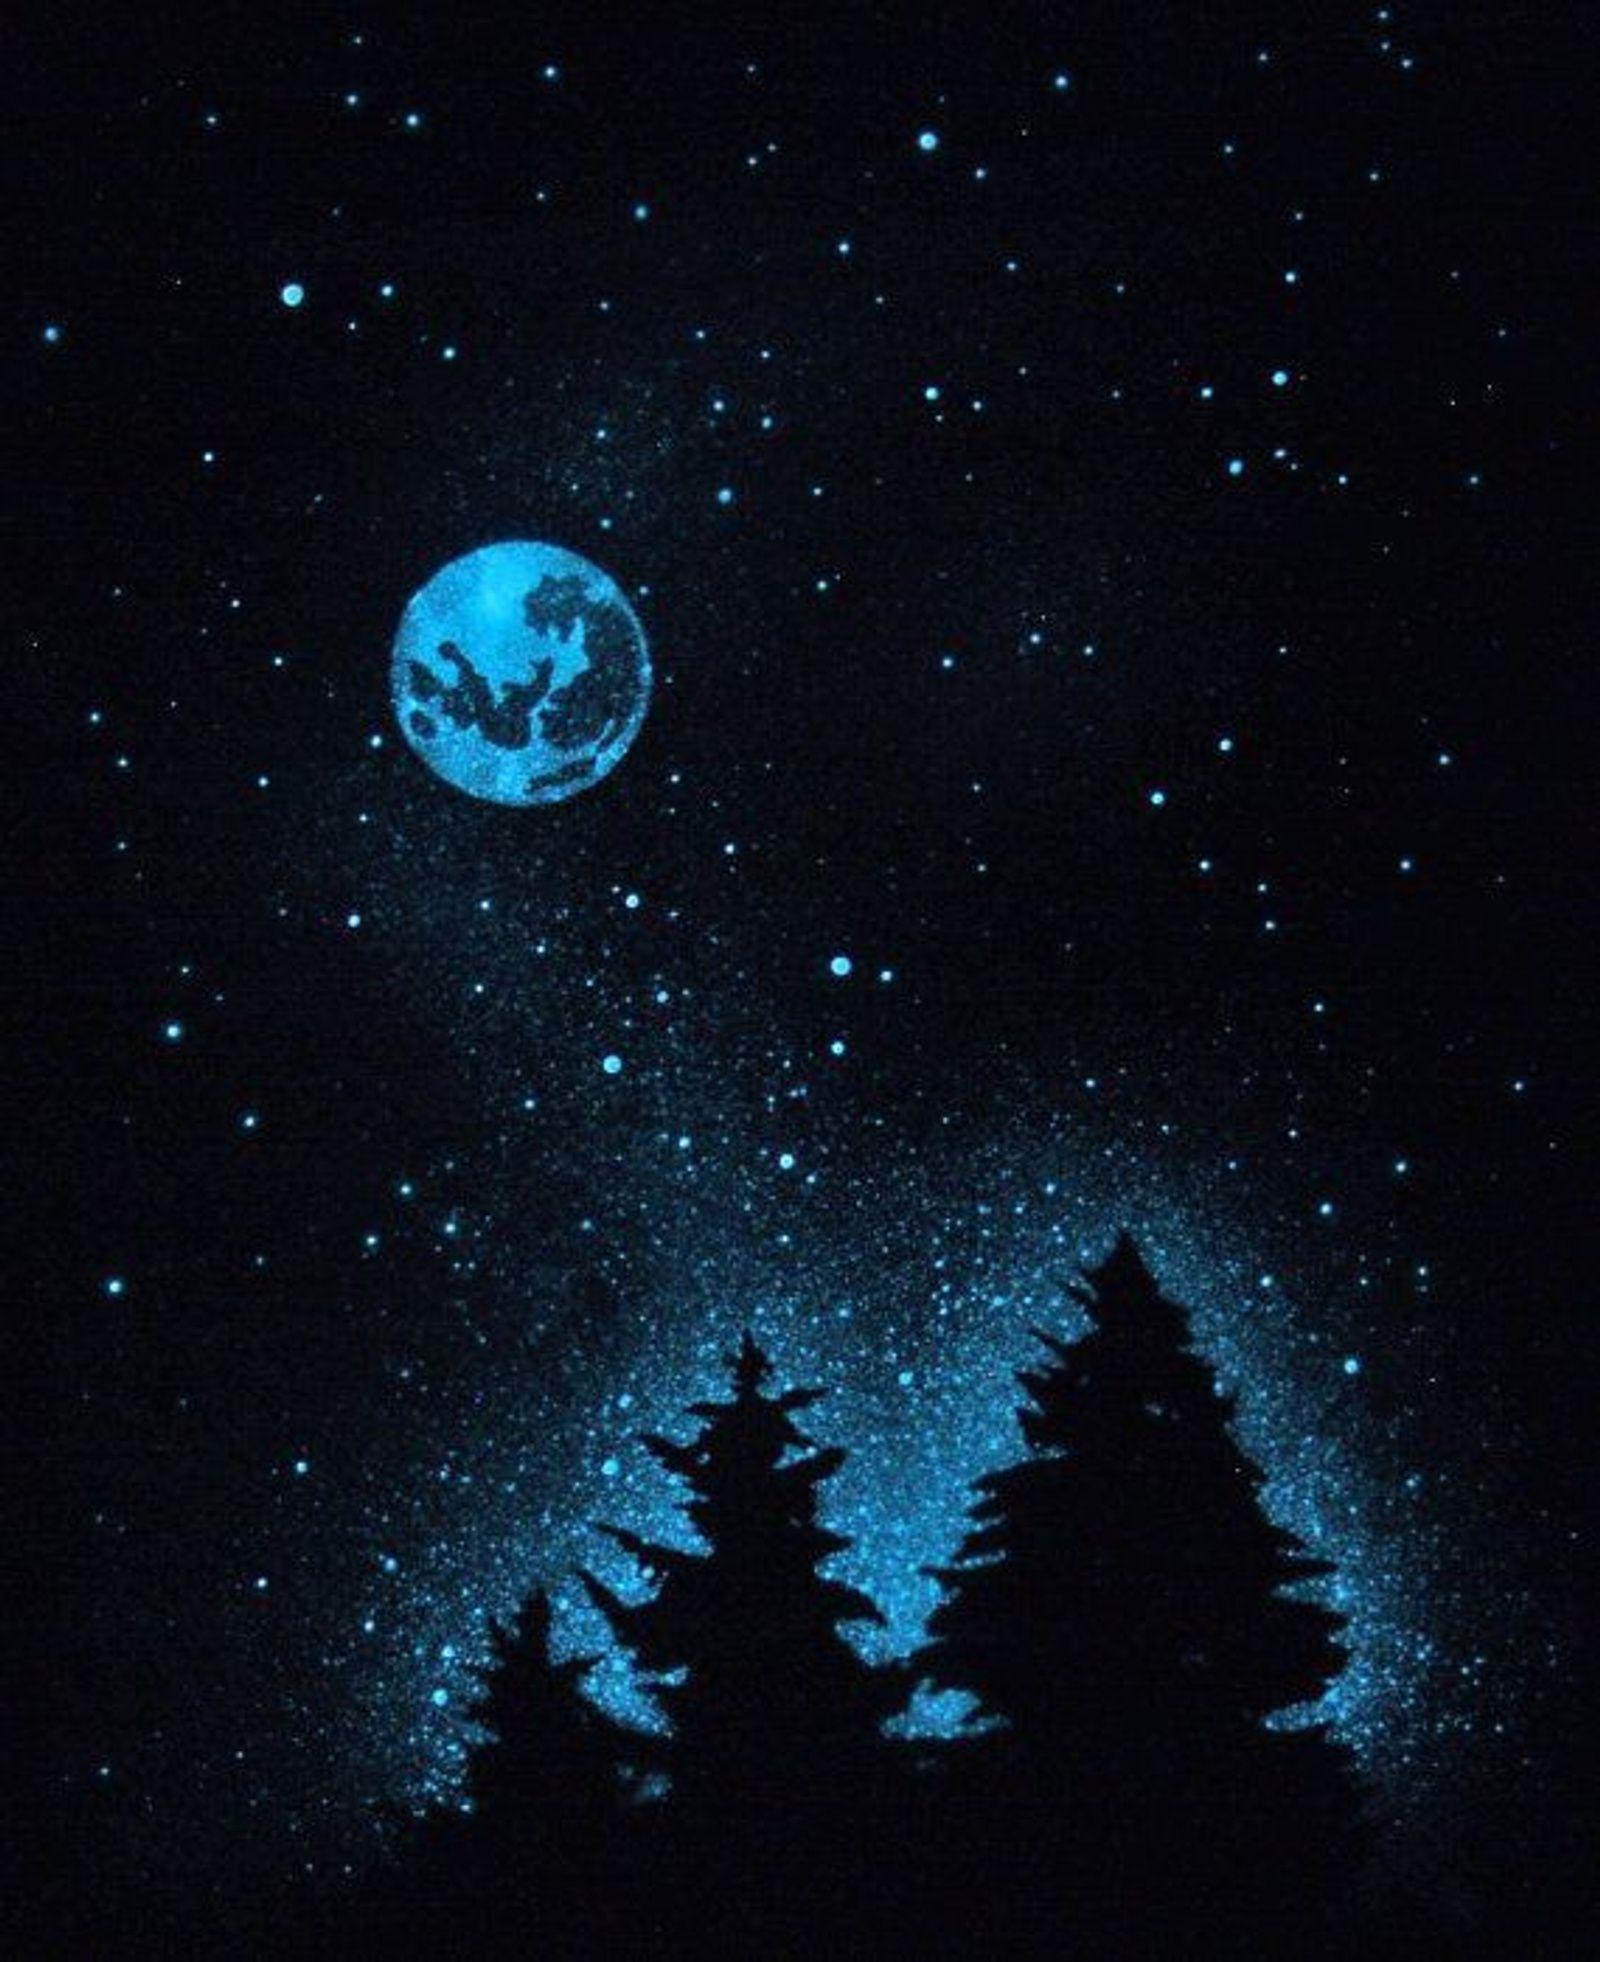 In Studio - Glow in the Dark - Starry Night & Moon - Paint Night